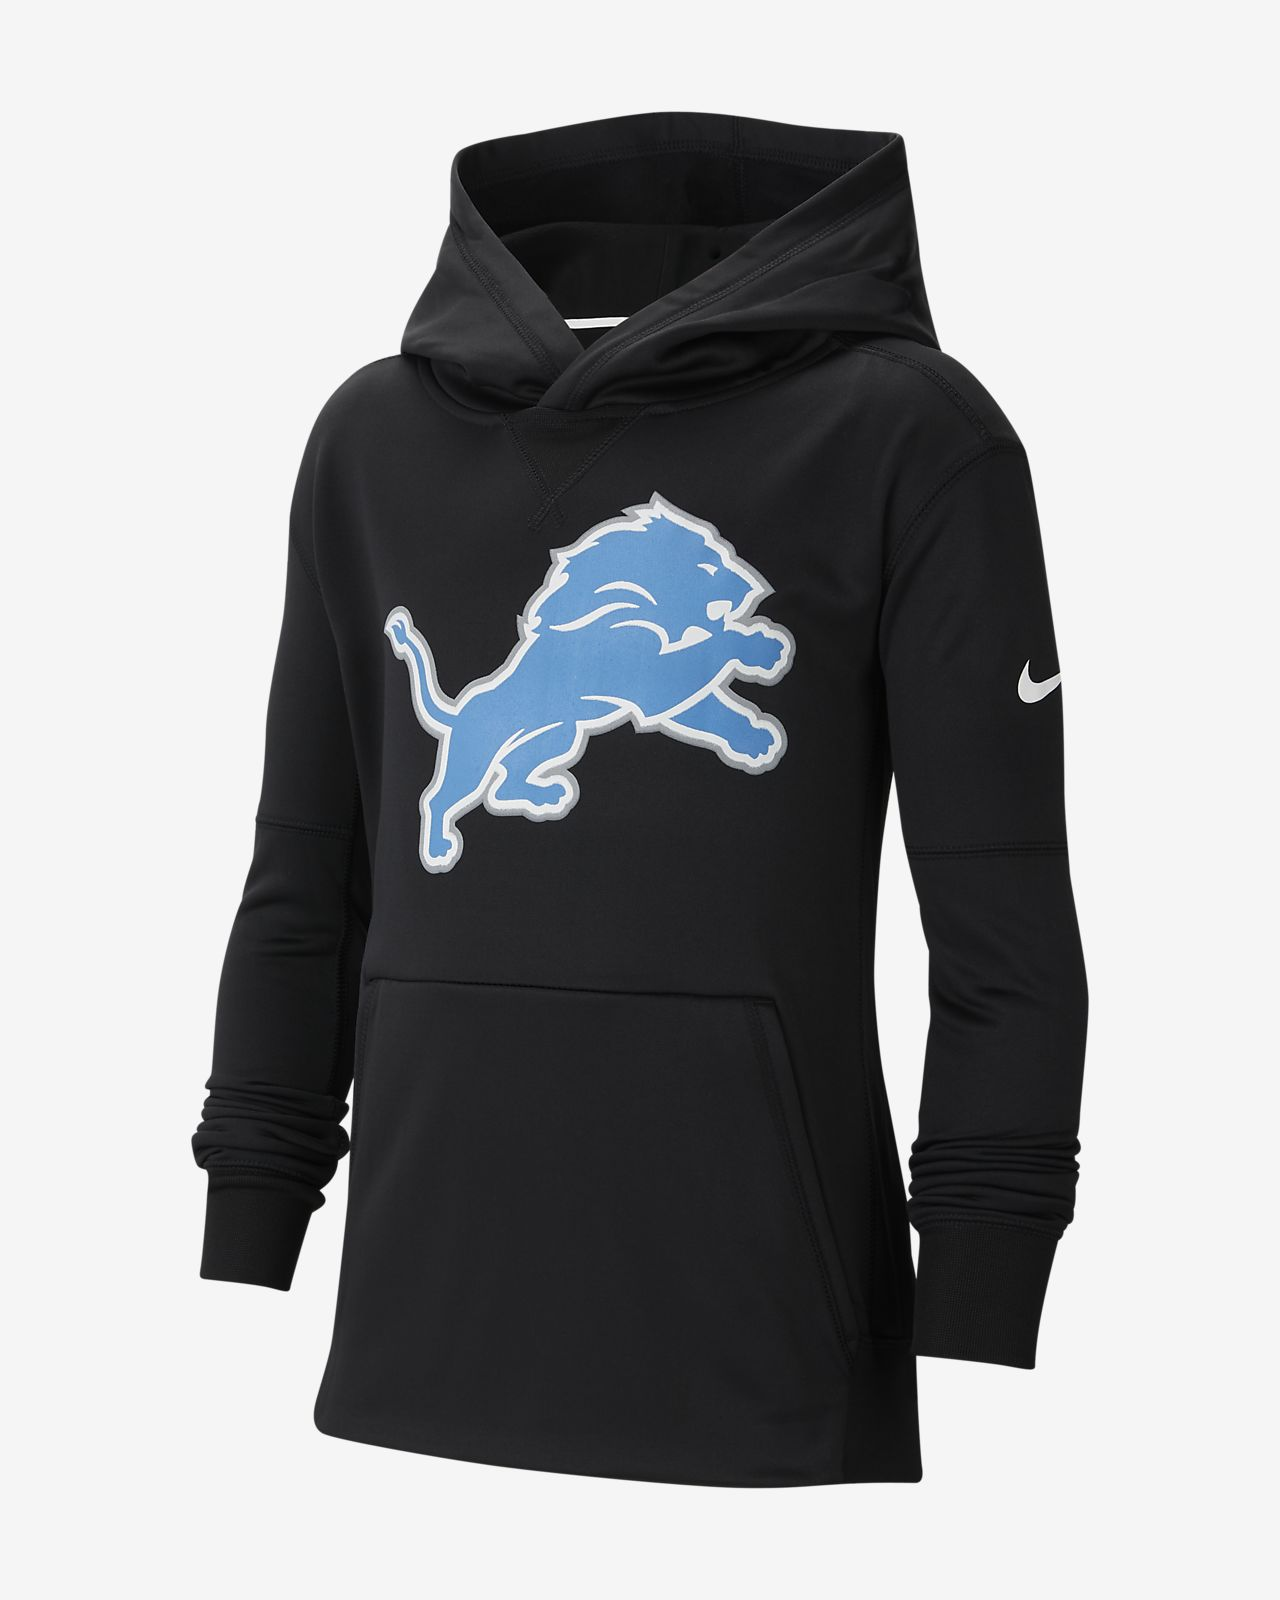 Nike (NFL Lions) Big Kids' Logo Hoodie